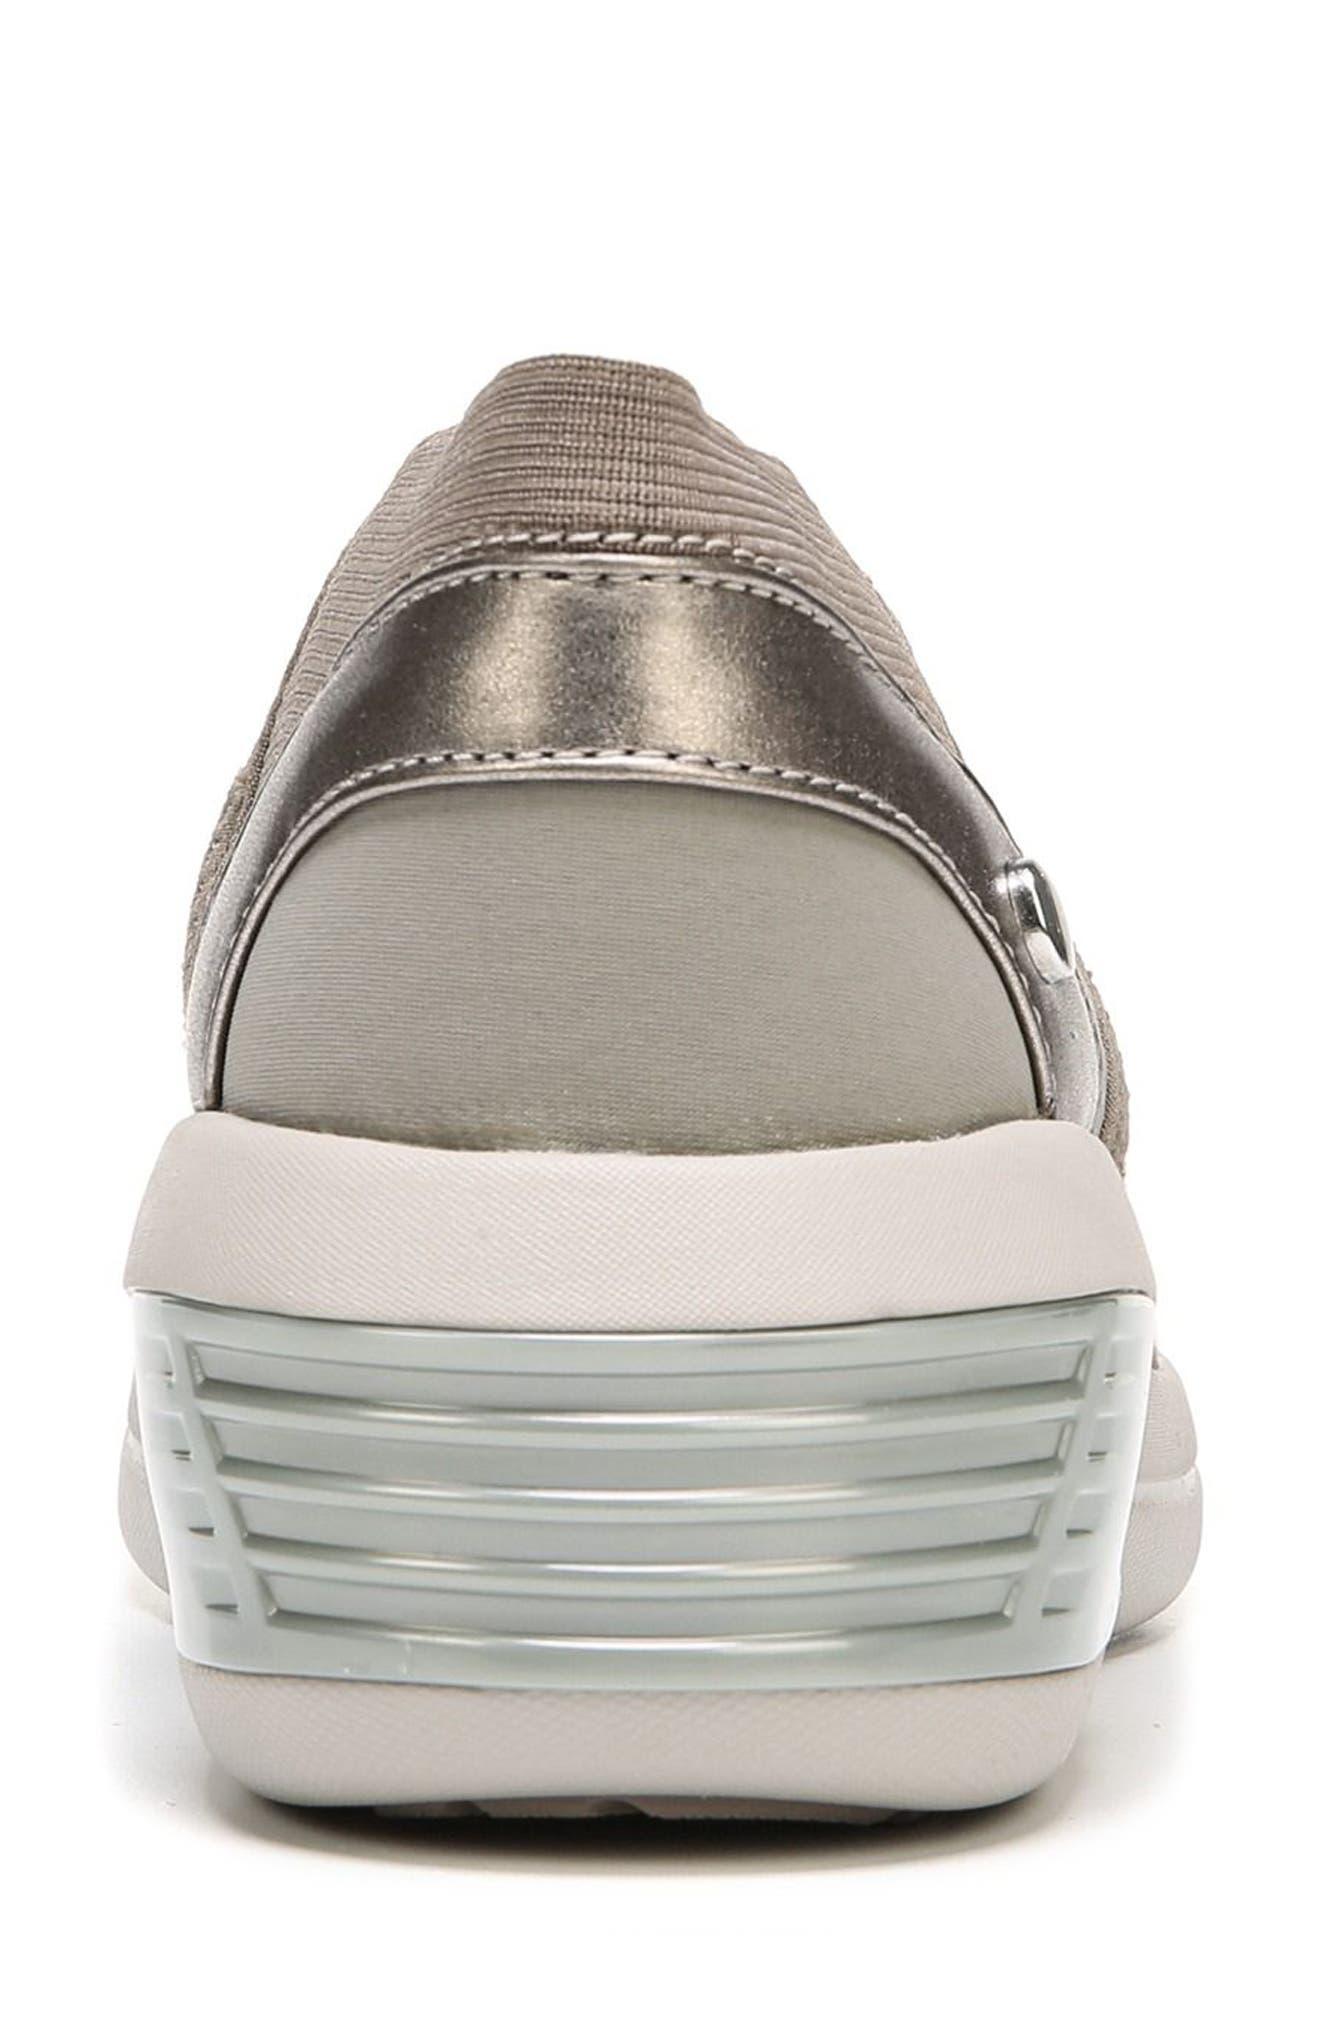 BZEES, Fling Wedge Sneaker, Alternate thumbnail 7, color, BROWN FABRIC